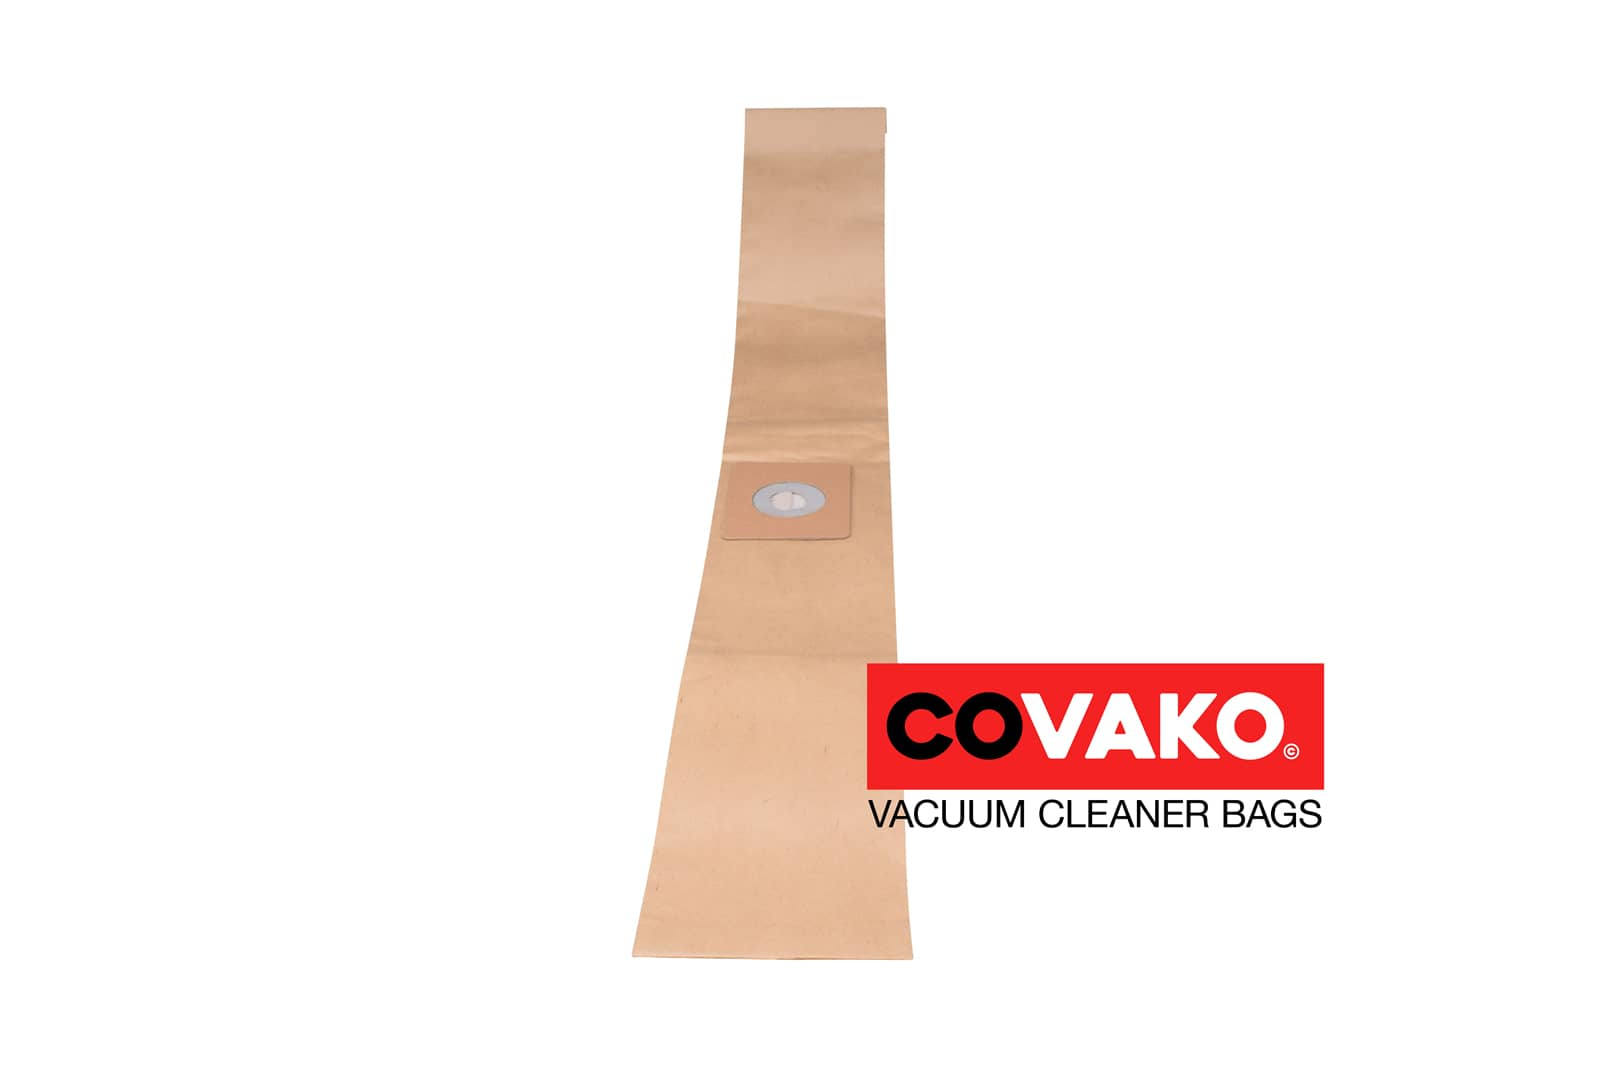 Clean a la Card Silent 10 / Paper - Clean a la Card vacuum cleaner bags